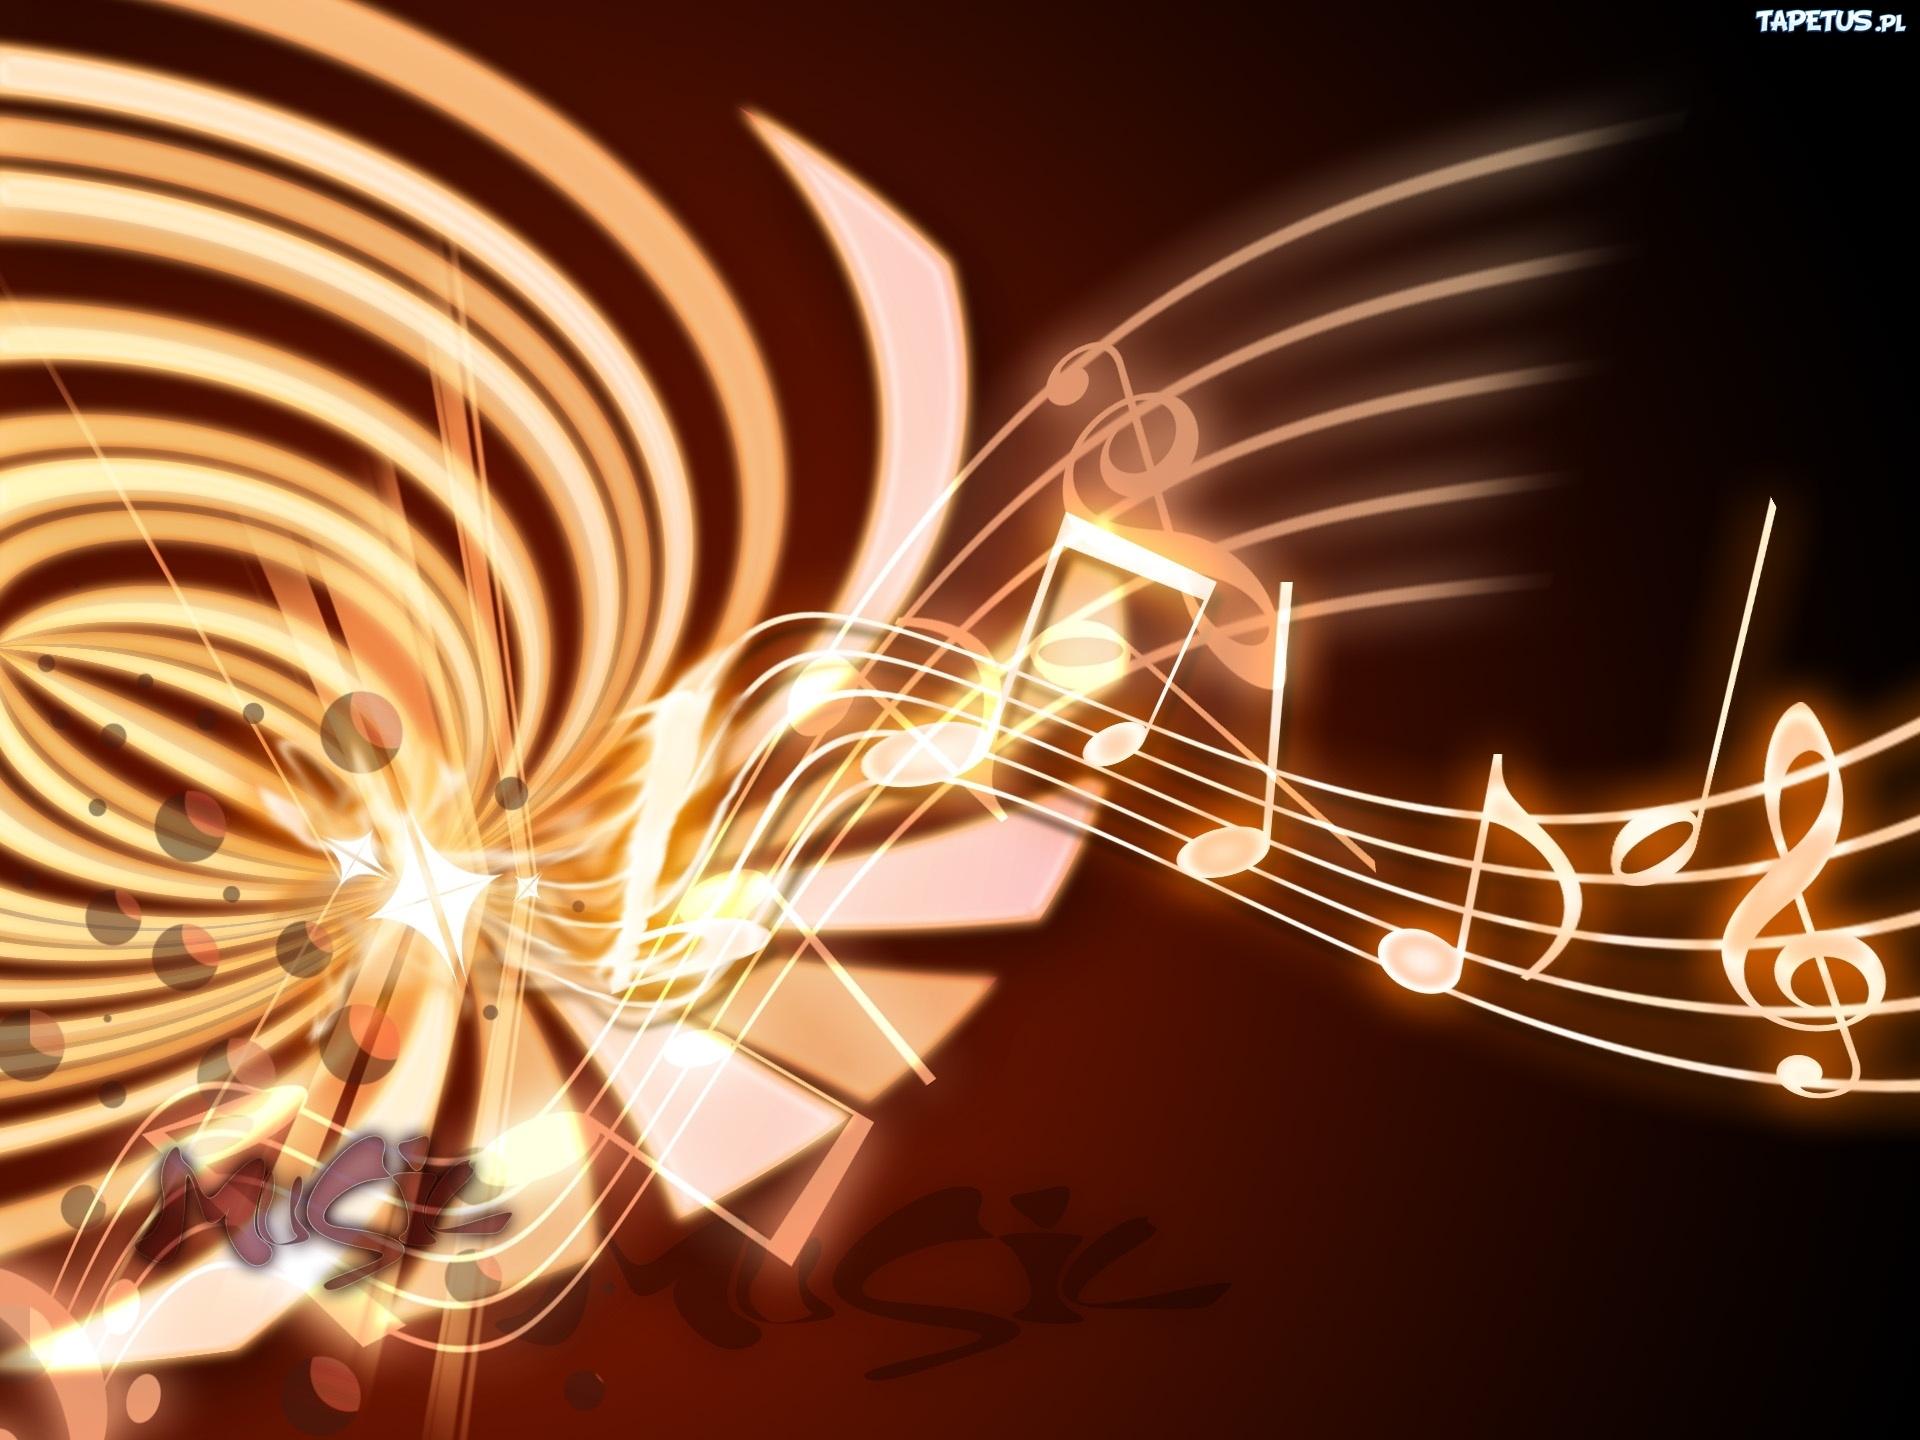 Tapeta Pięciolinia, Nuty, Muzyka